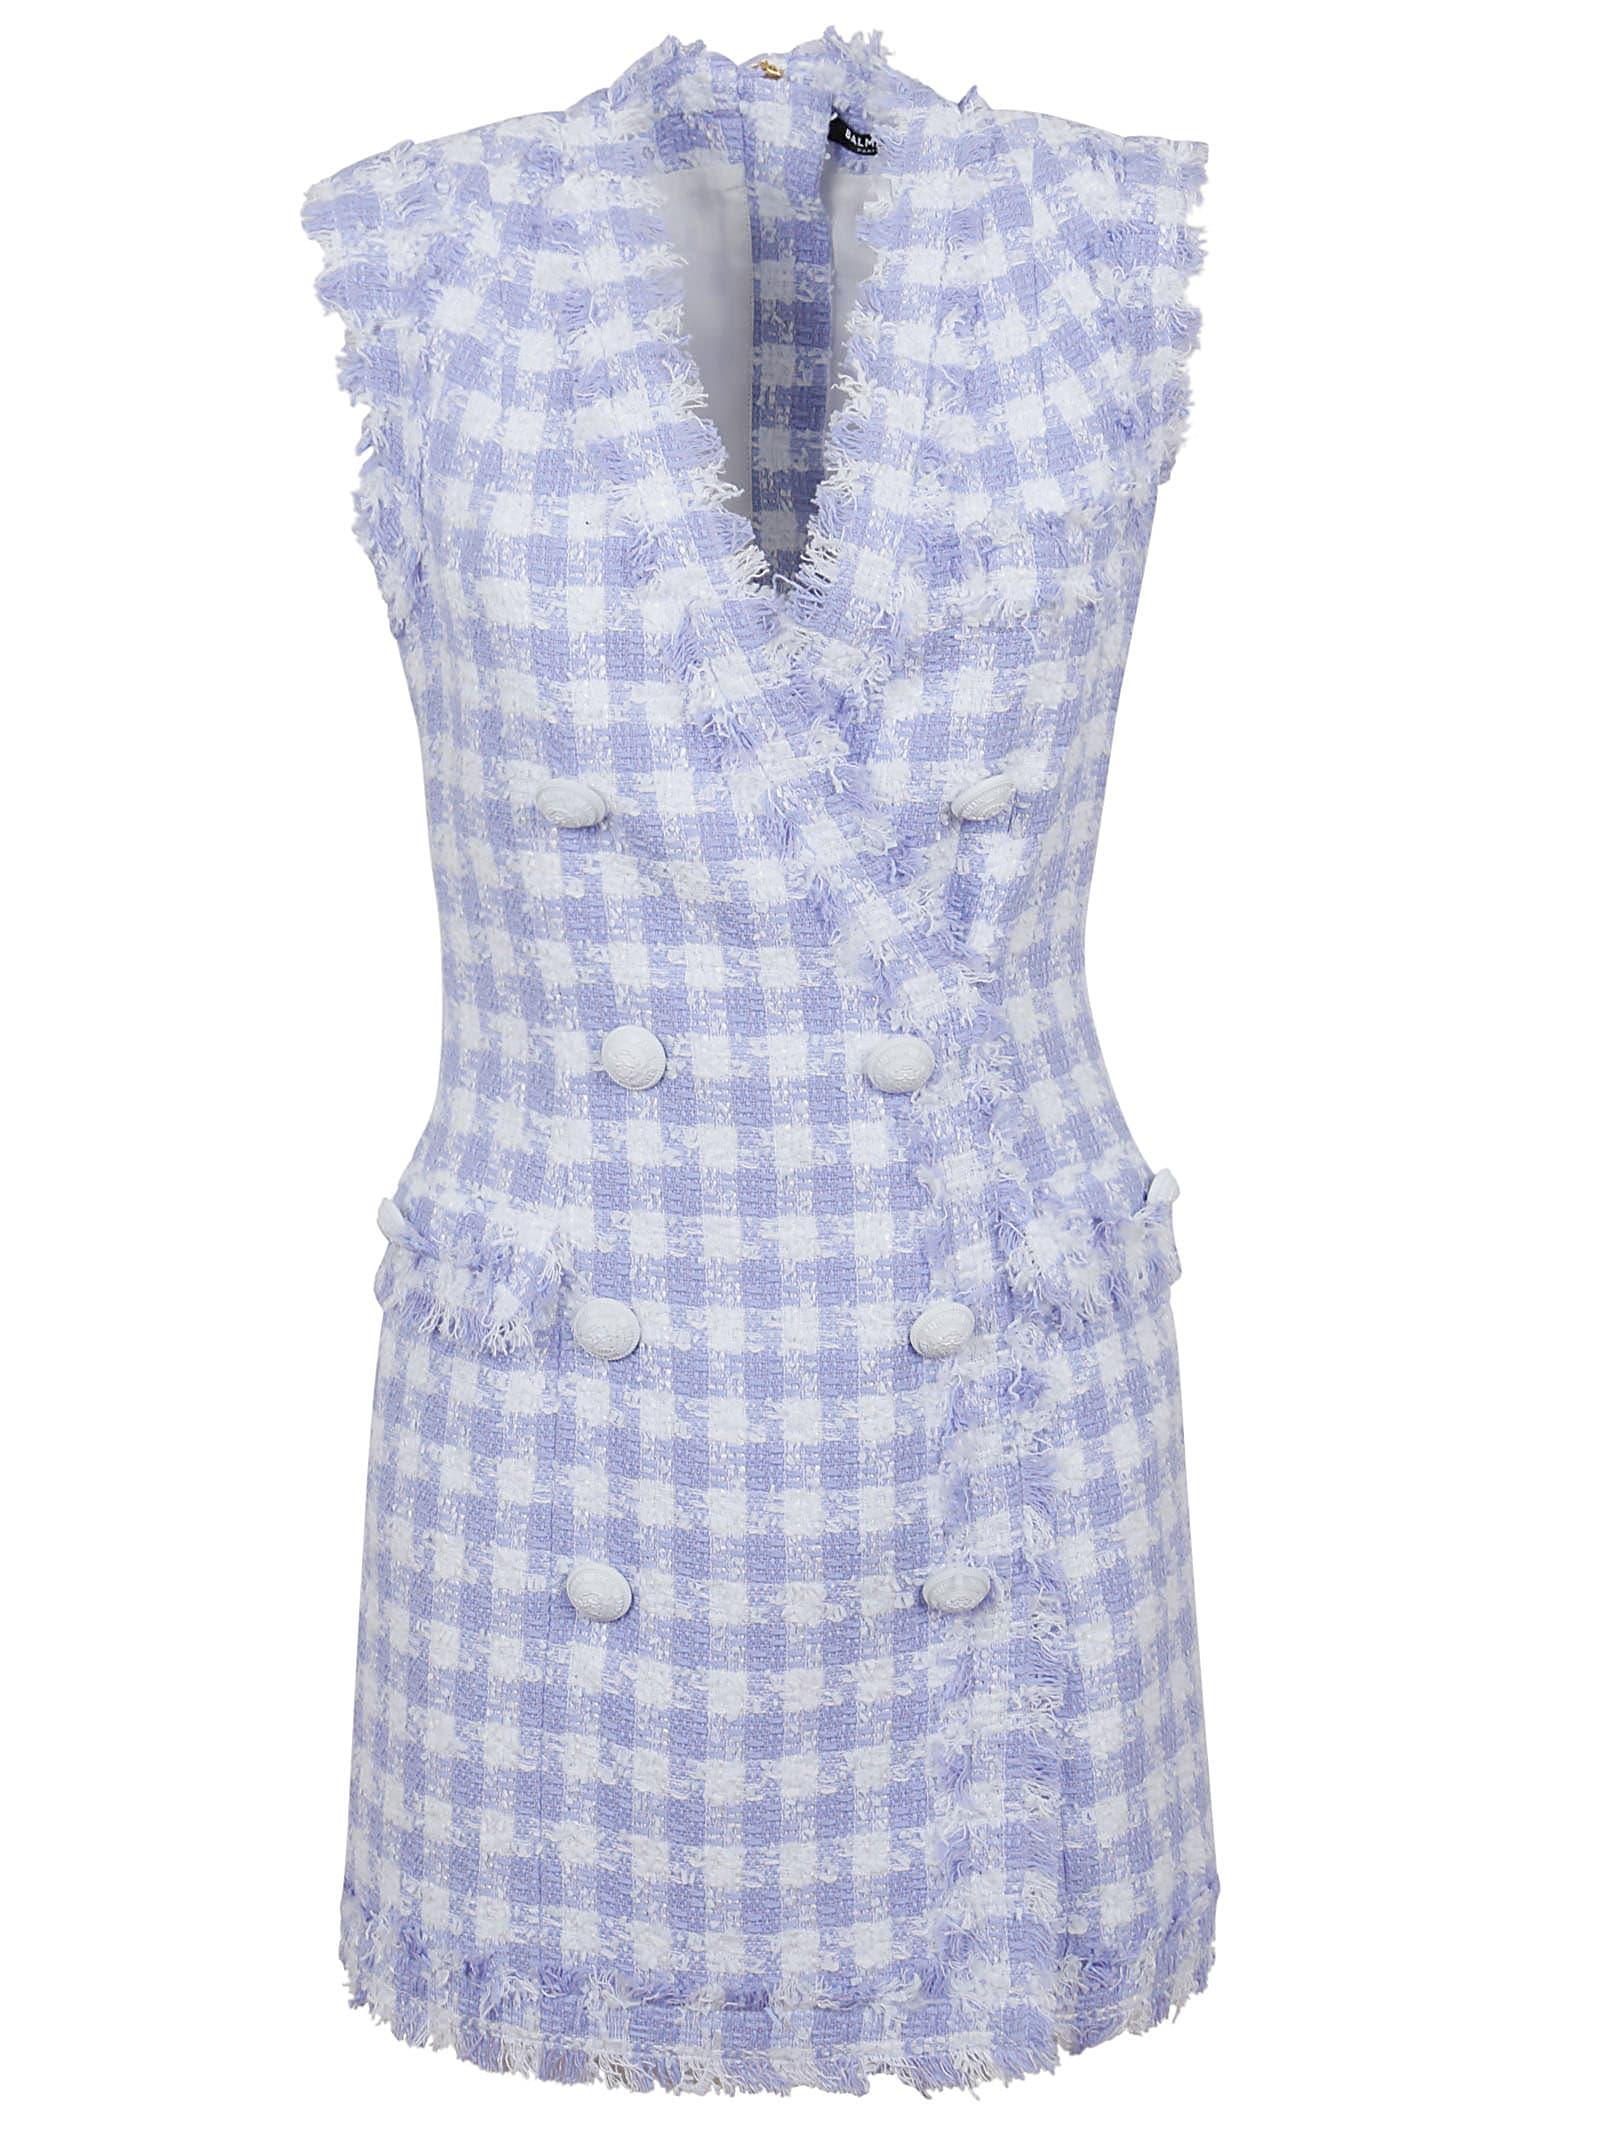 Buy Balmain Sleeveless 8 Btn Gingham Tweed Dress online, shop Balmain with free shipping